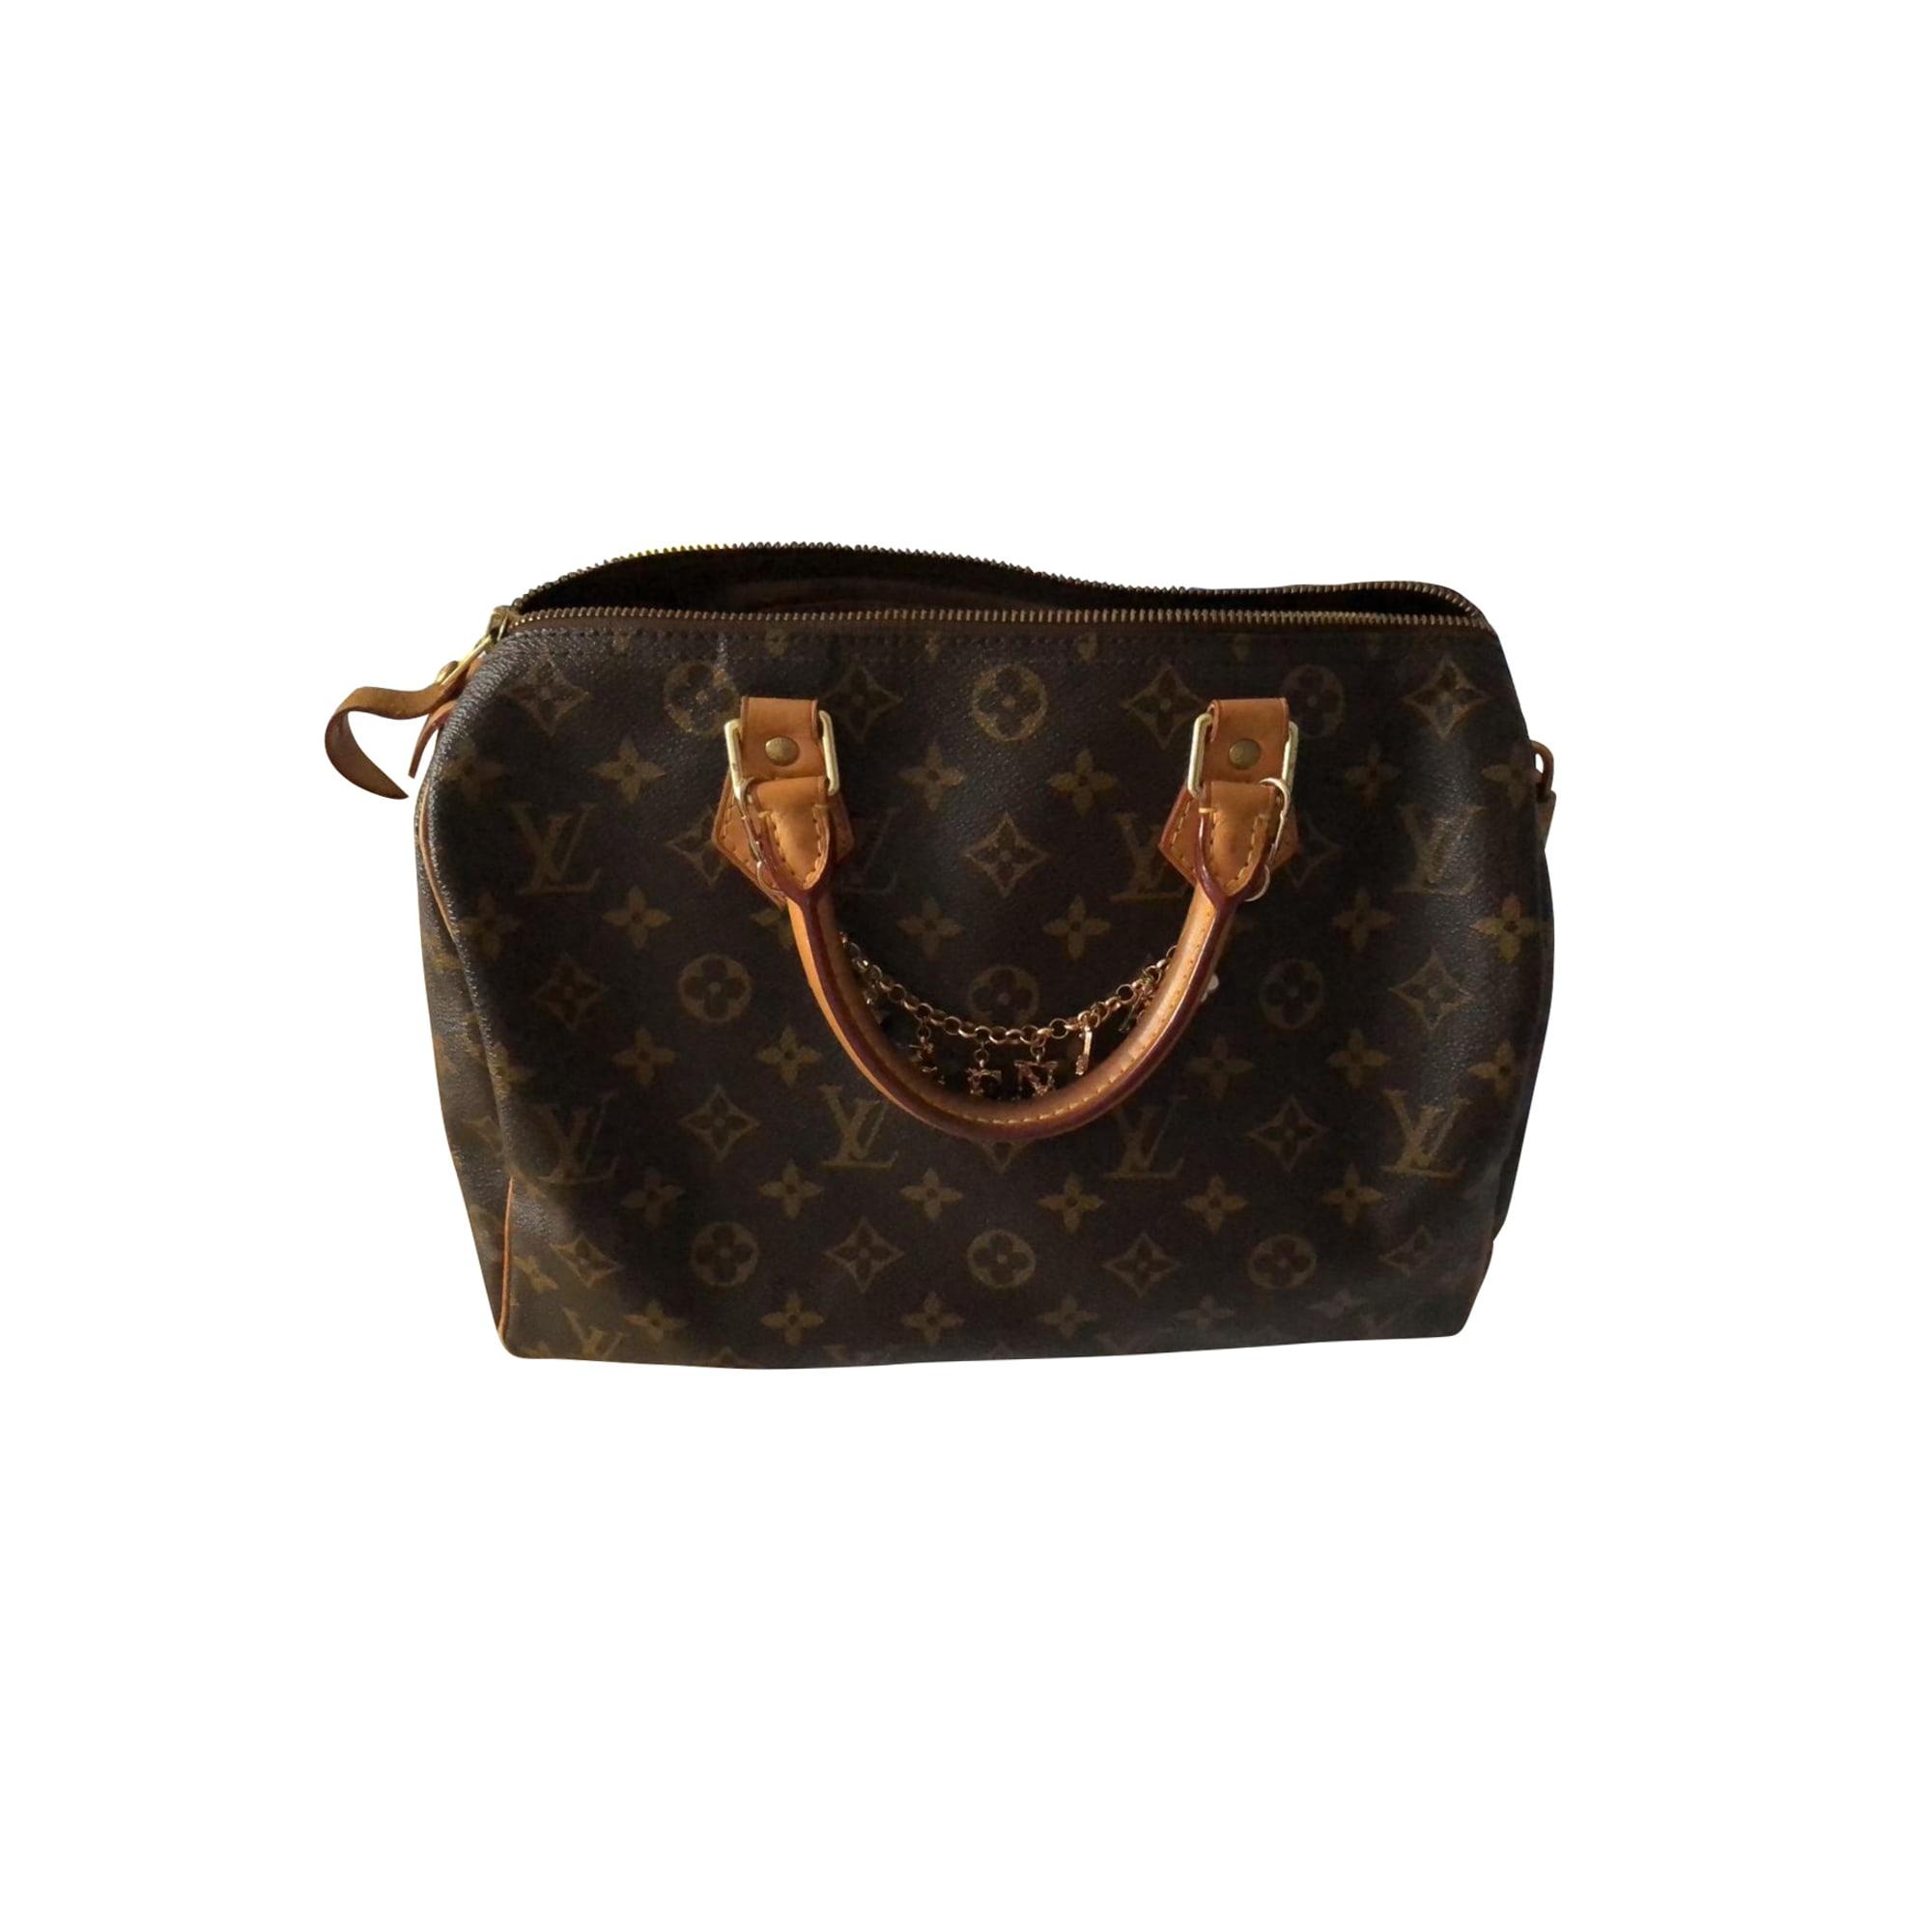 Leather Handbag LOUIS VUITTON Speedy Monogram